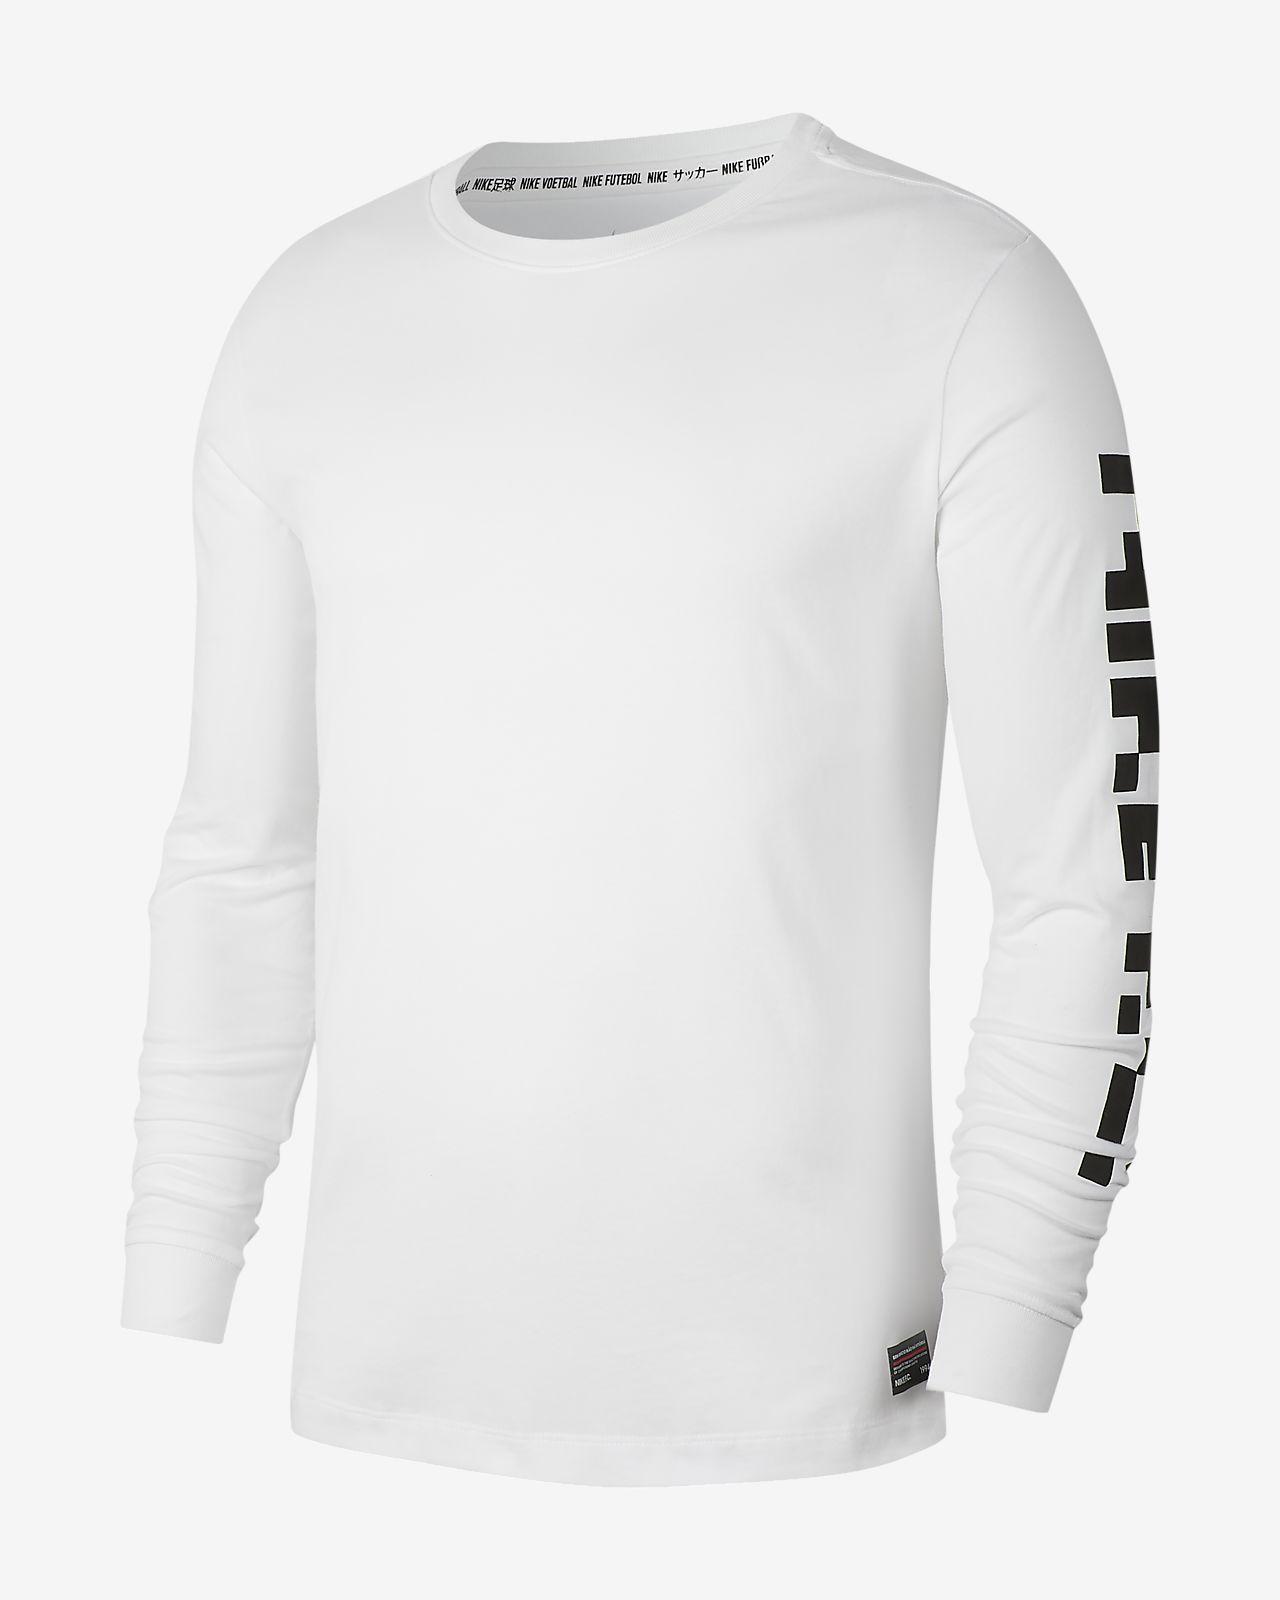 T-shirt da calcio a manica lunga Nike Dri-FIT F.C. - Uomo